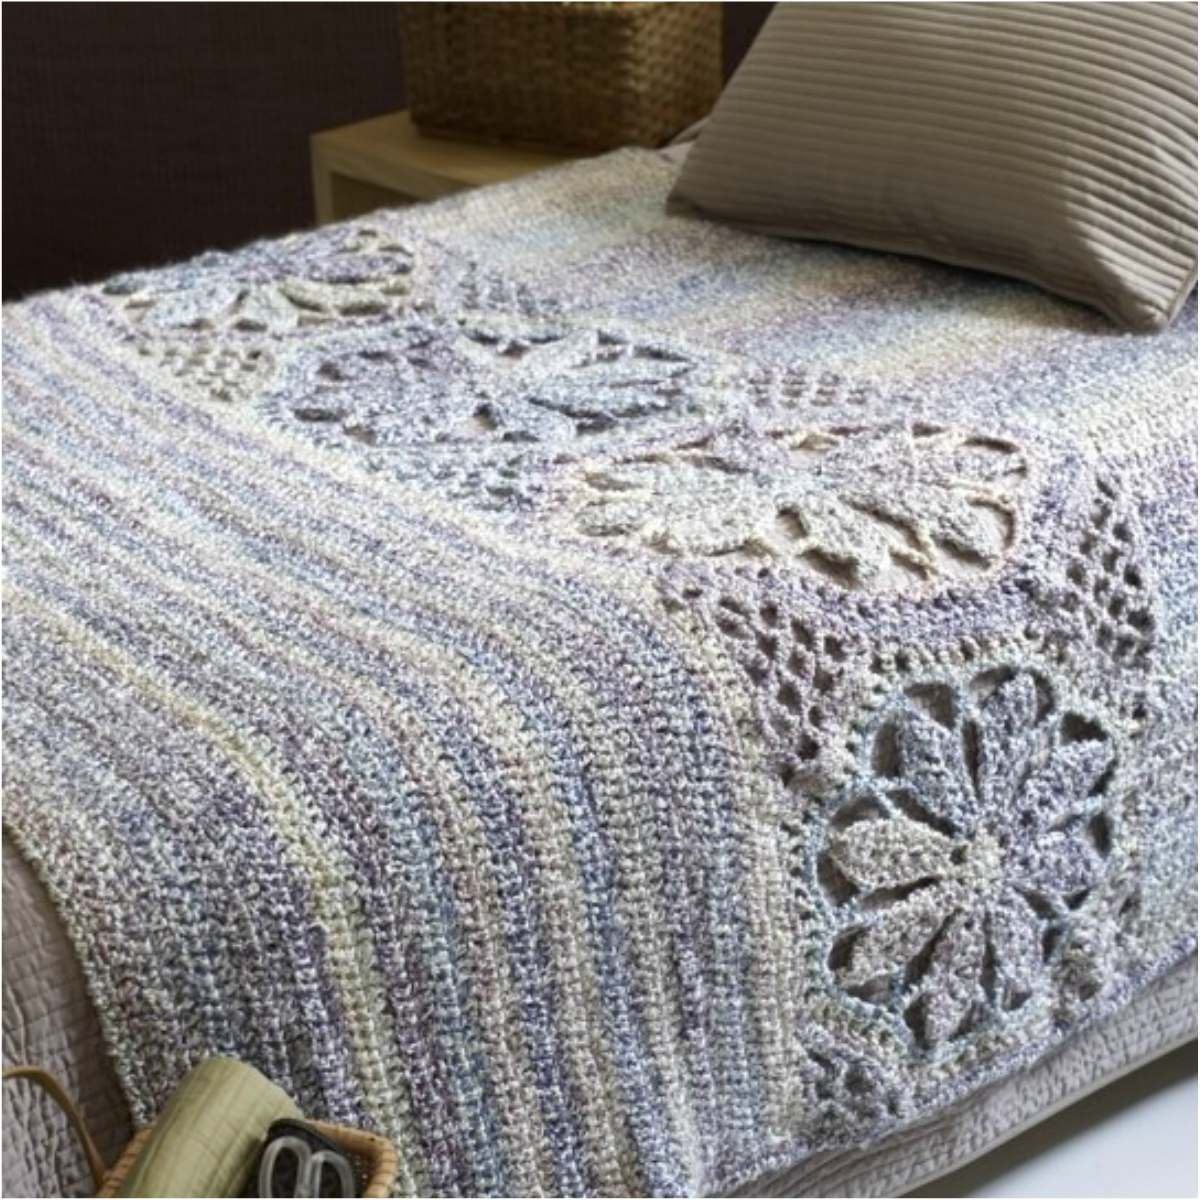 magnolia-afghan-free-crochet-pattern-fb   Crochet